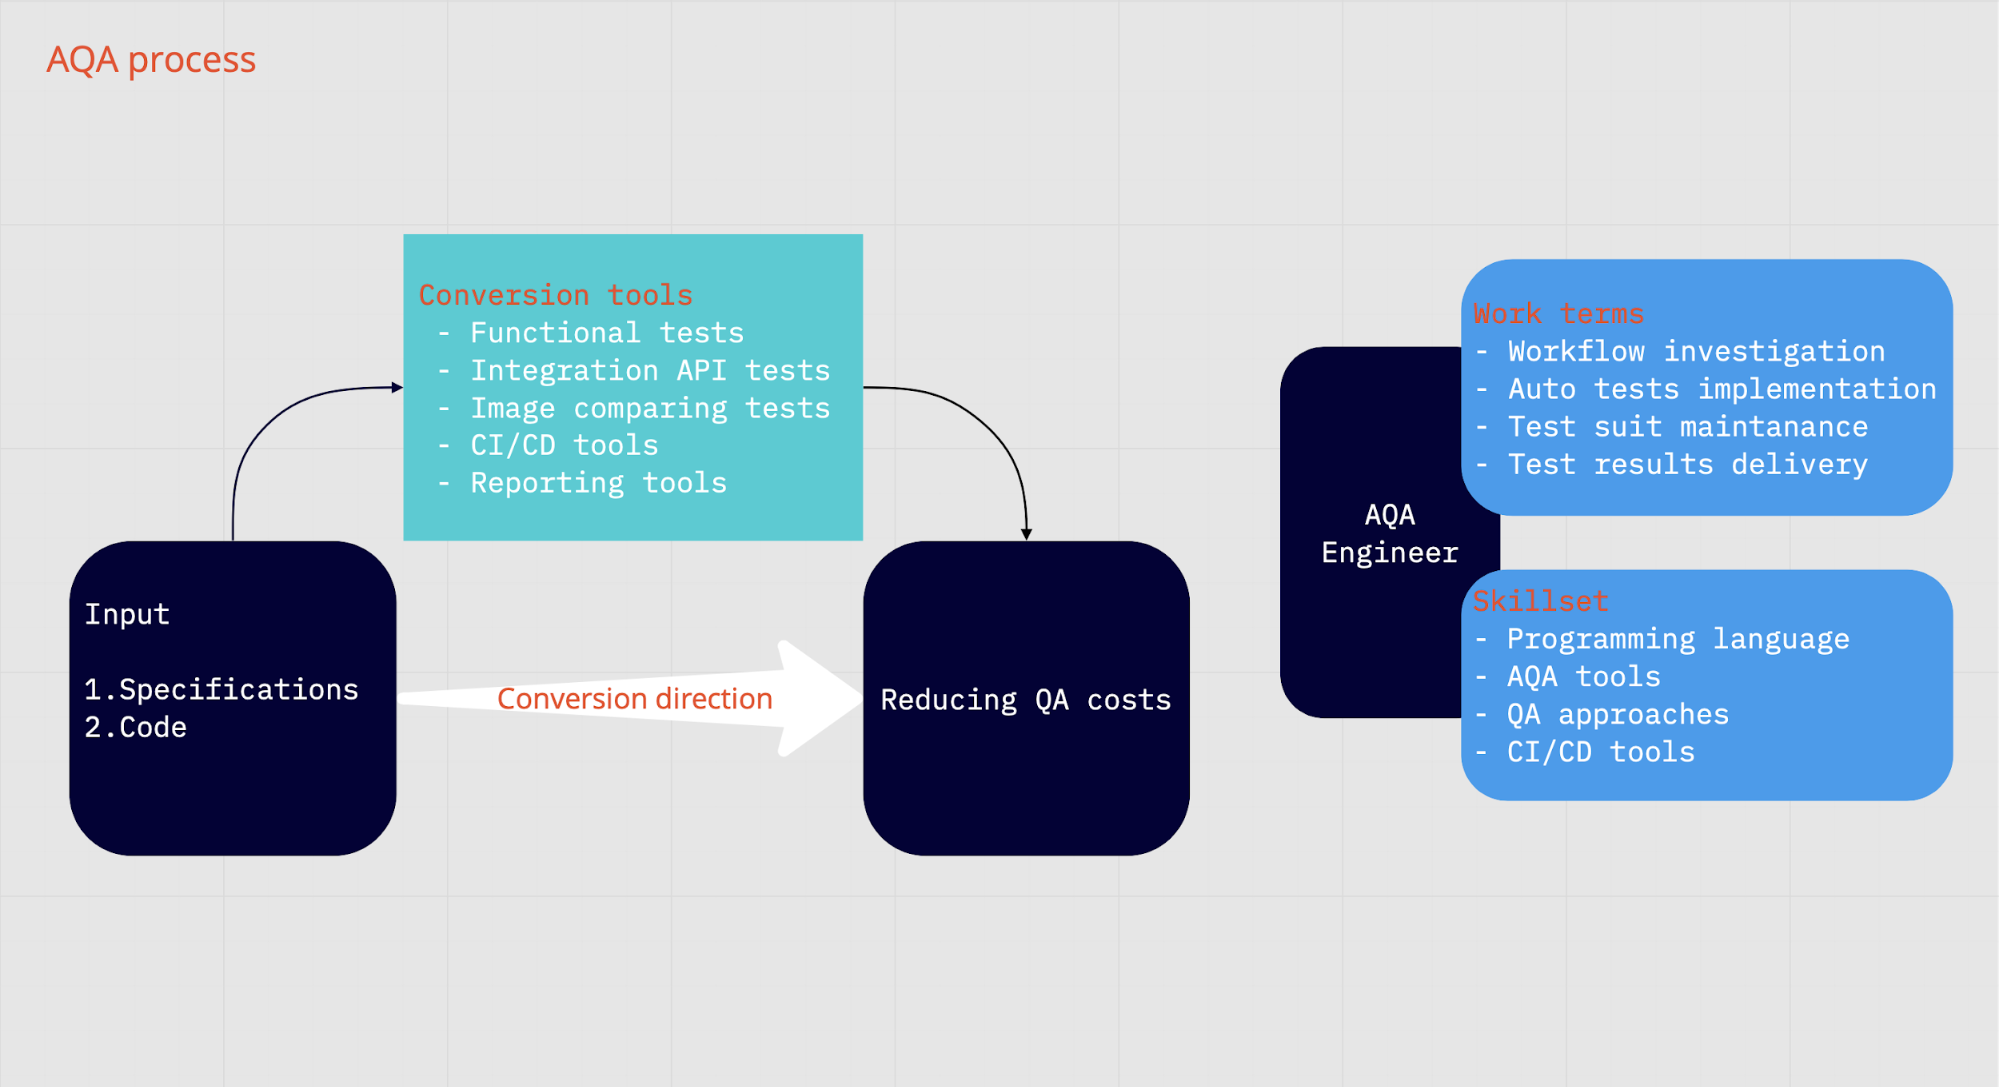 AQA process scheme